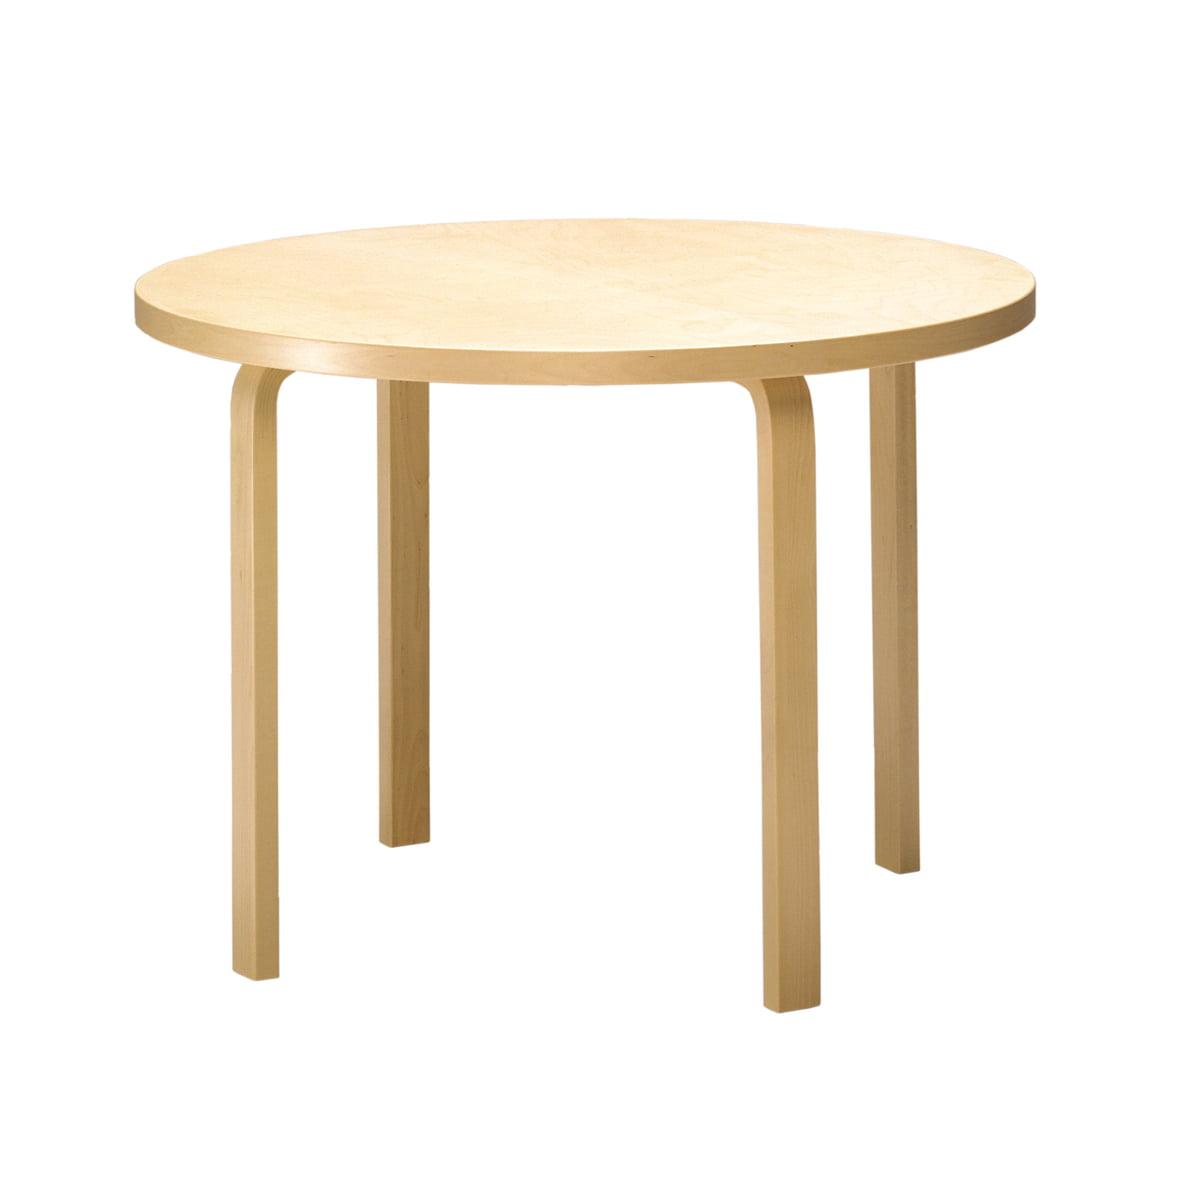 Tisch 90a artek for Tisch design schweiz